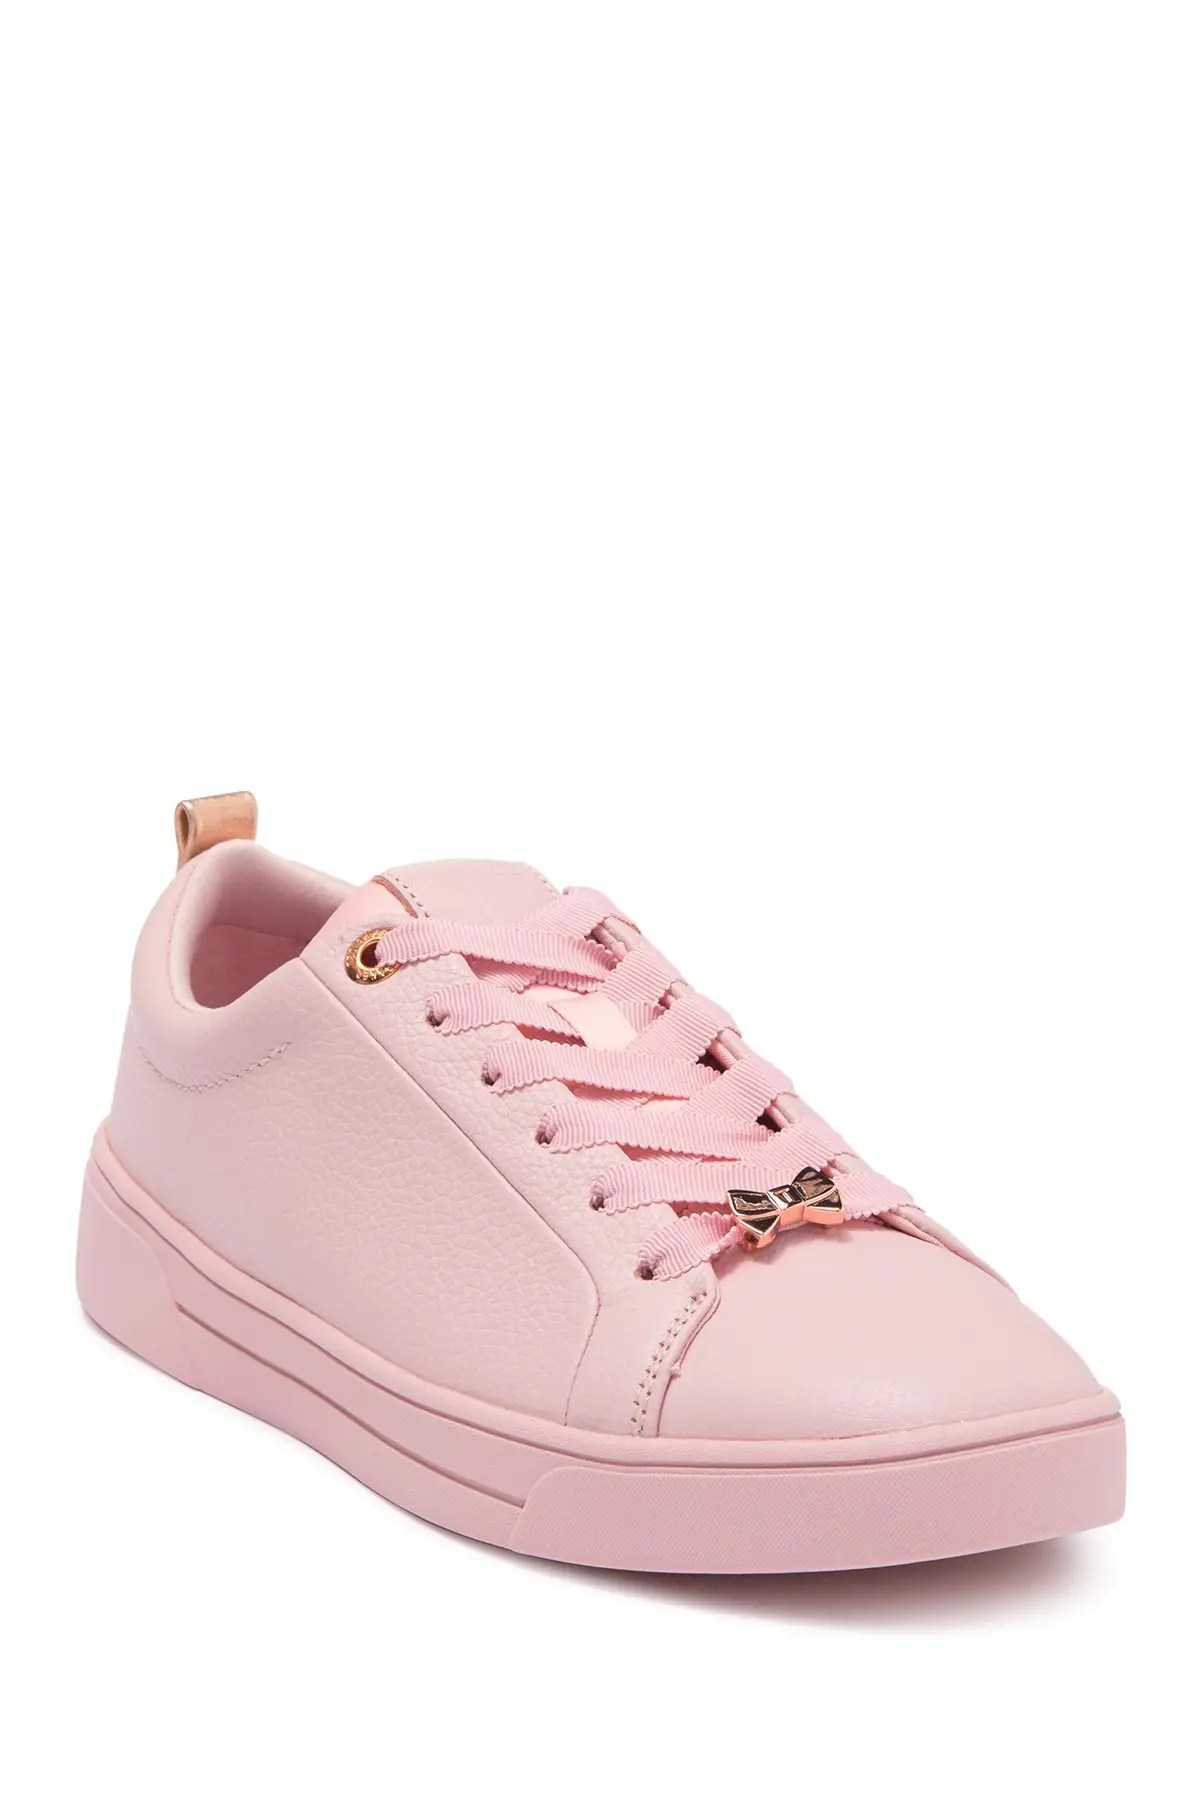 ted baker london sneakers for women